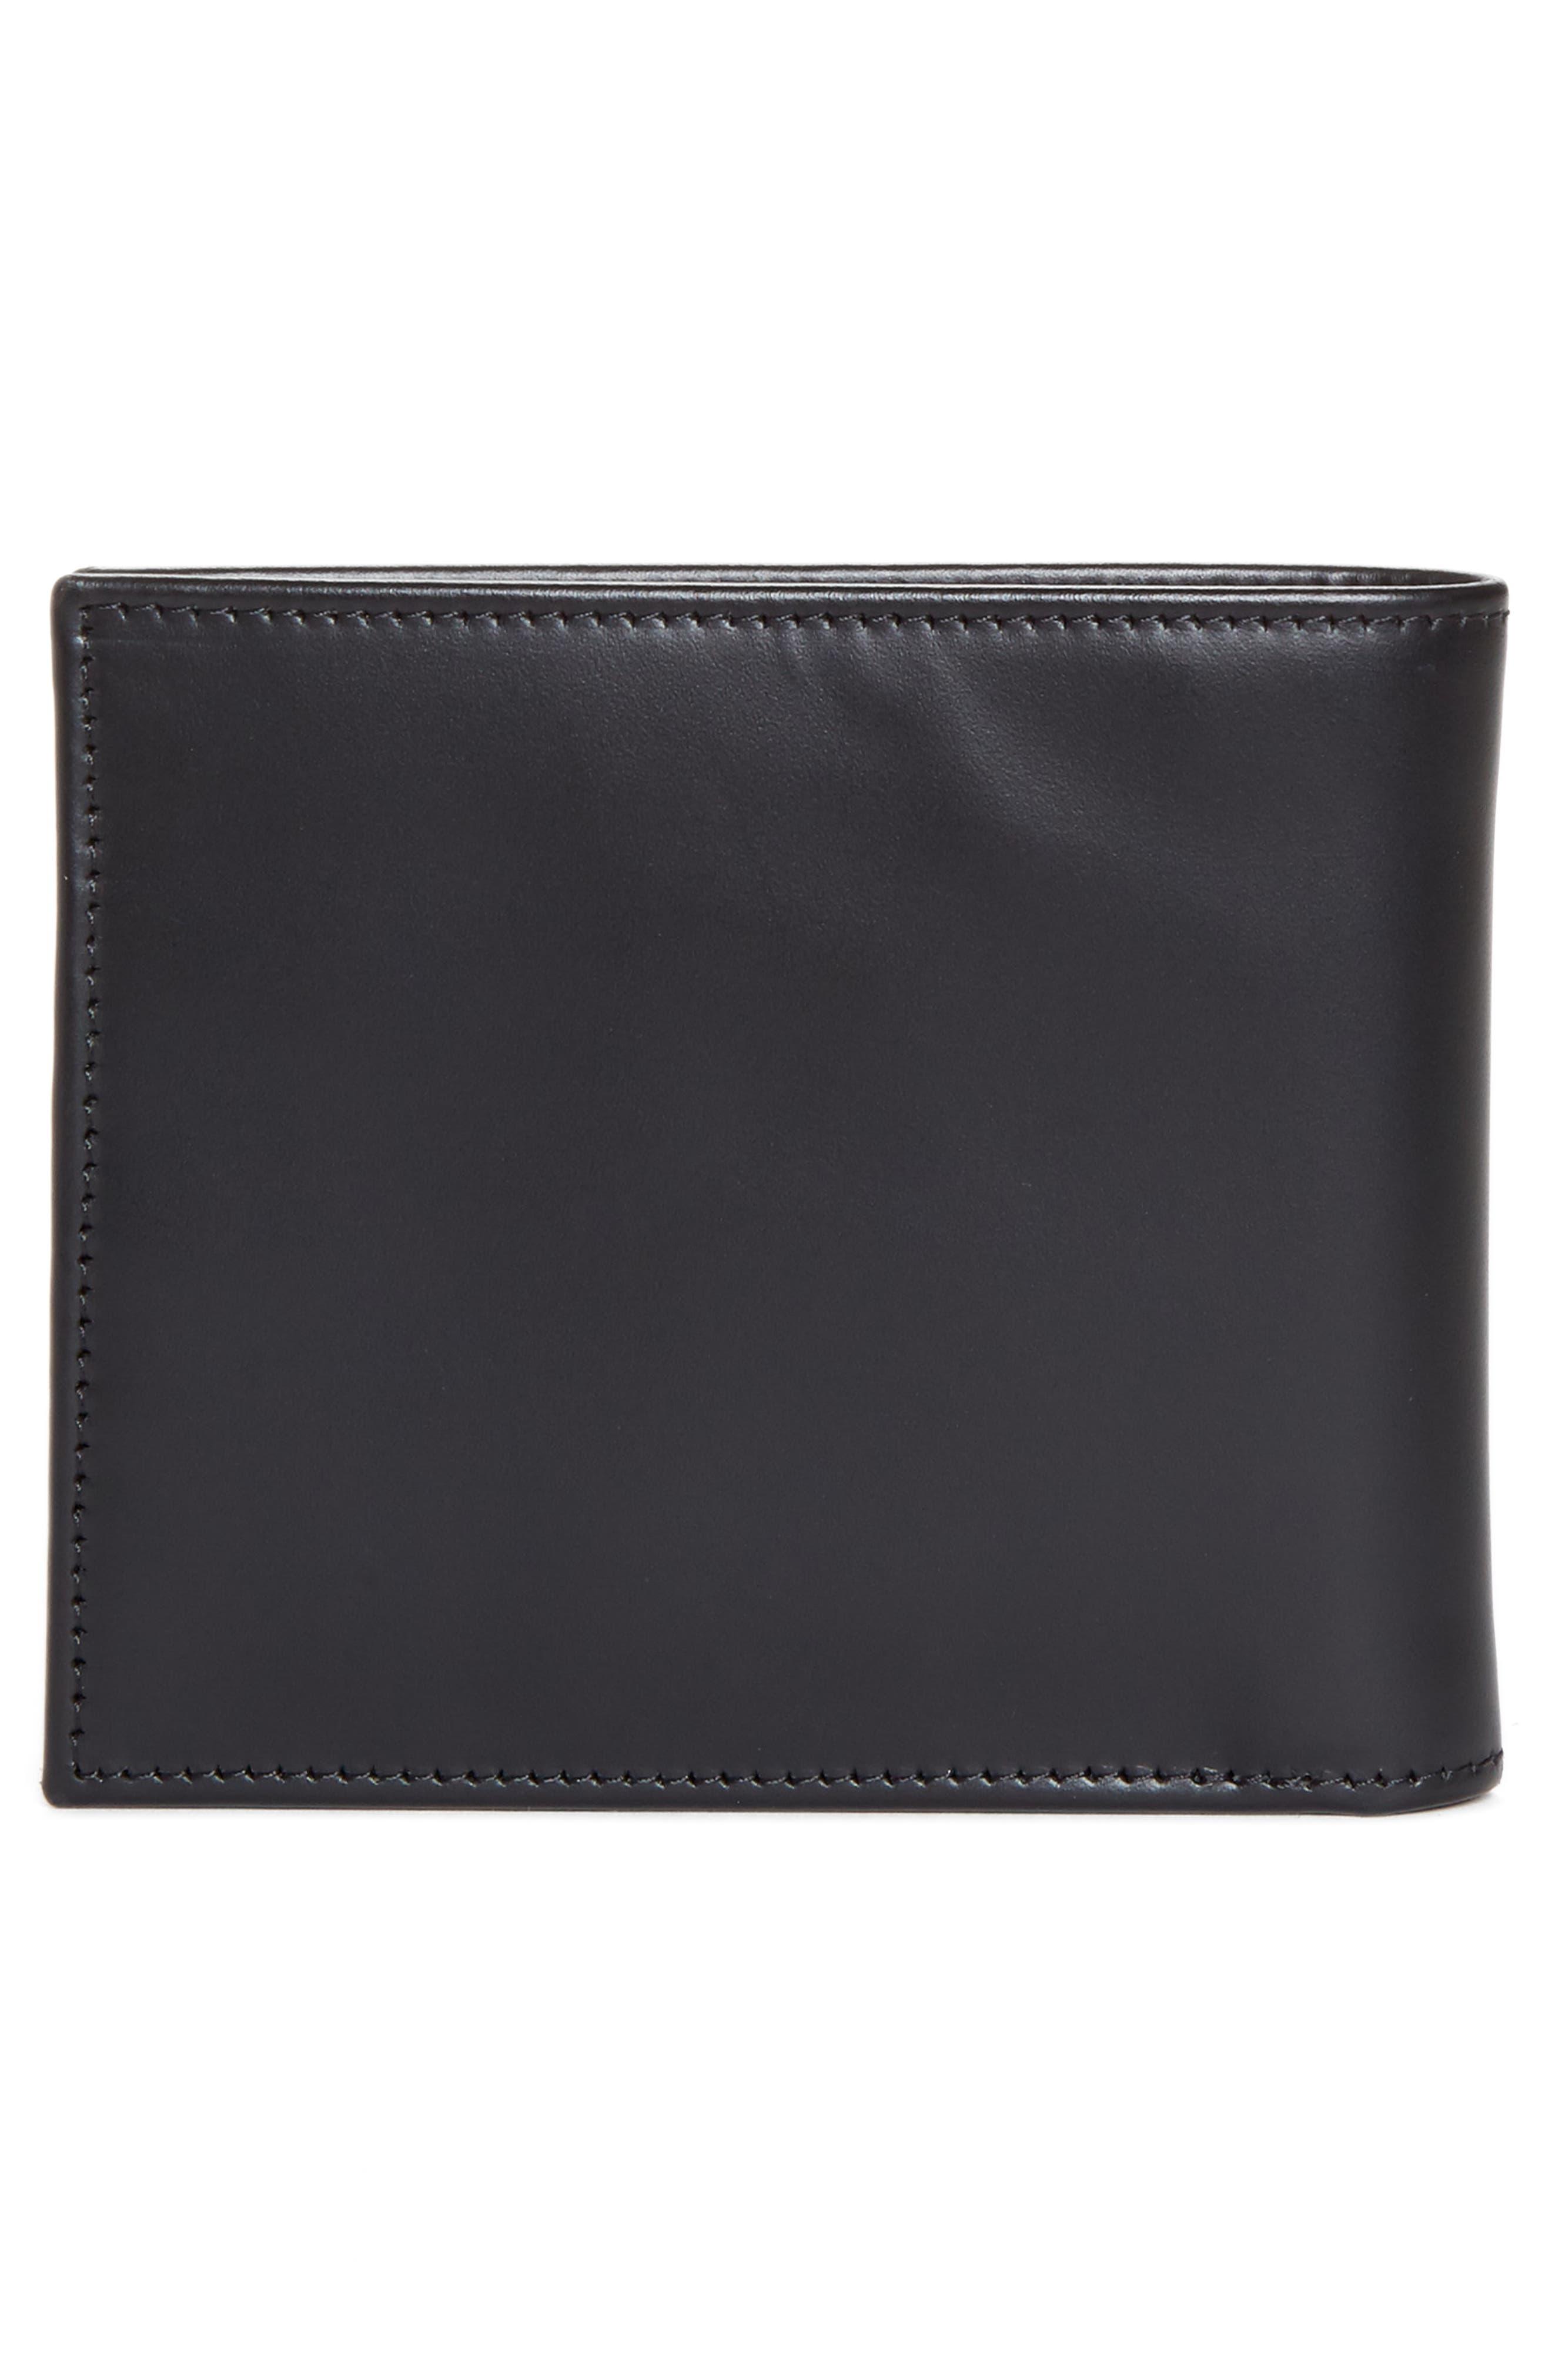 Multistripe Leather Wallet,                             Alternate thumbnail 3, color,                             Black